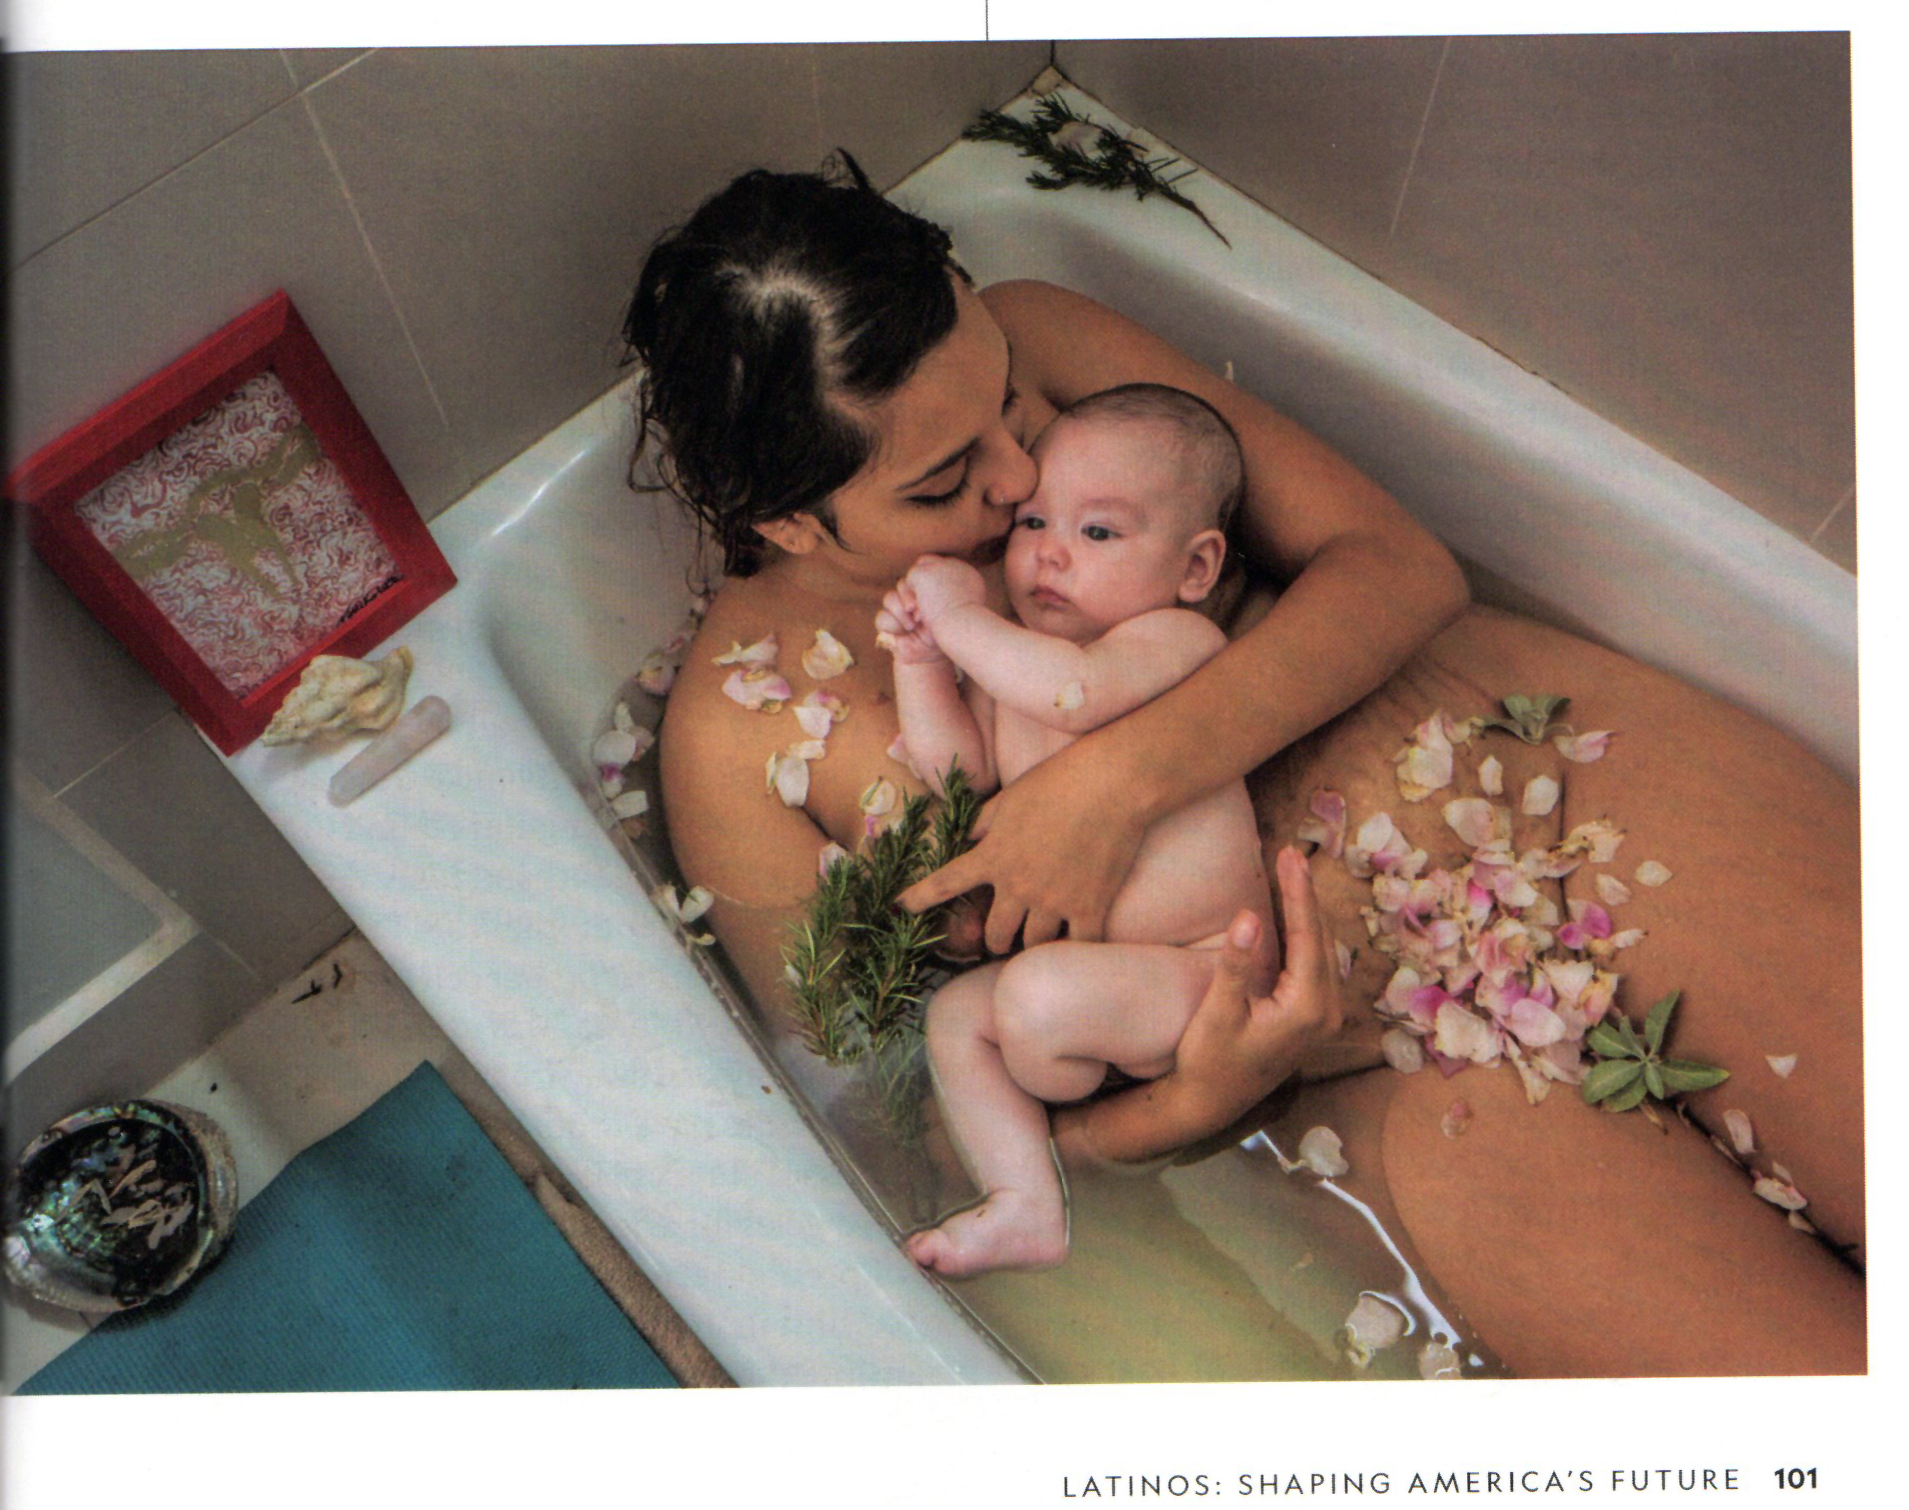 Photo by KARLA GACHET found at https://www.nationalgeographic.com/magazine/2018/07/latinos-hispanic-power-america-immigration-future/